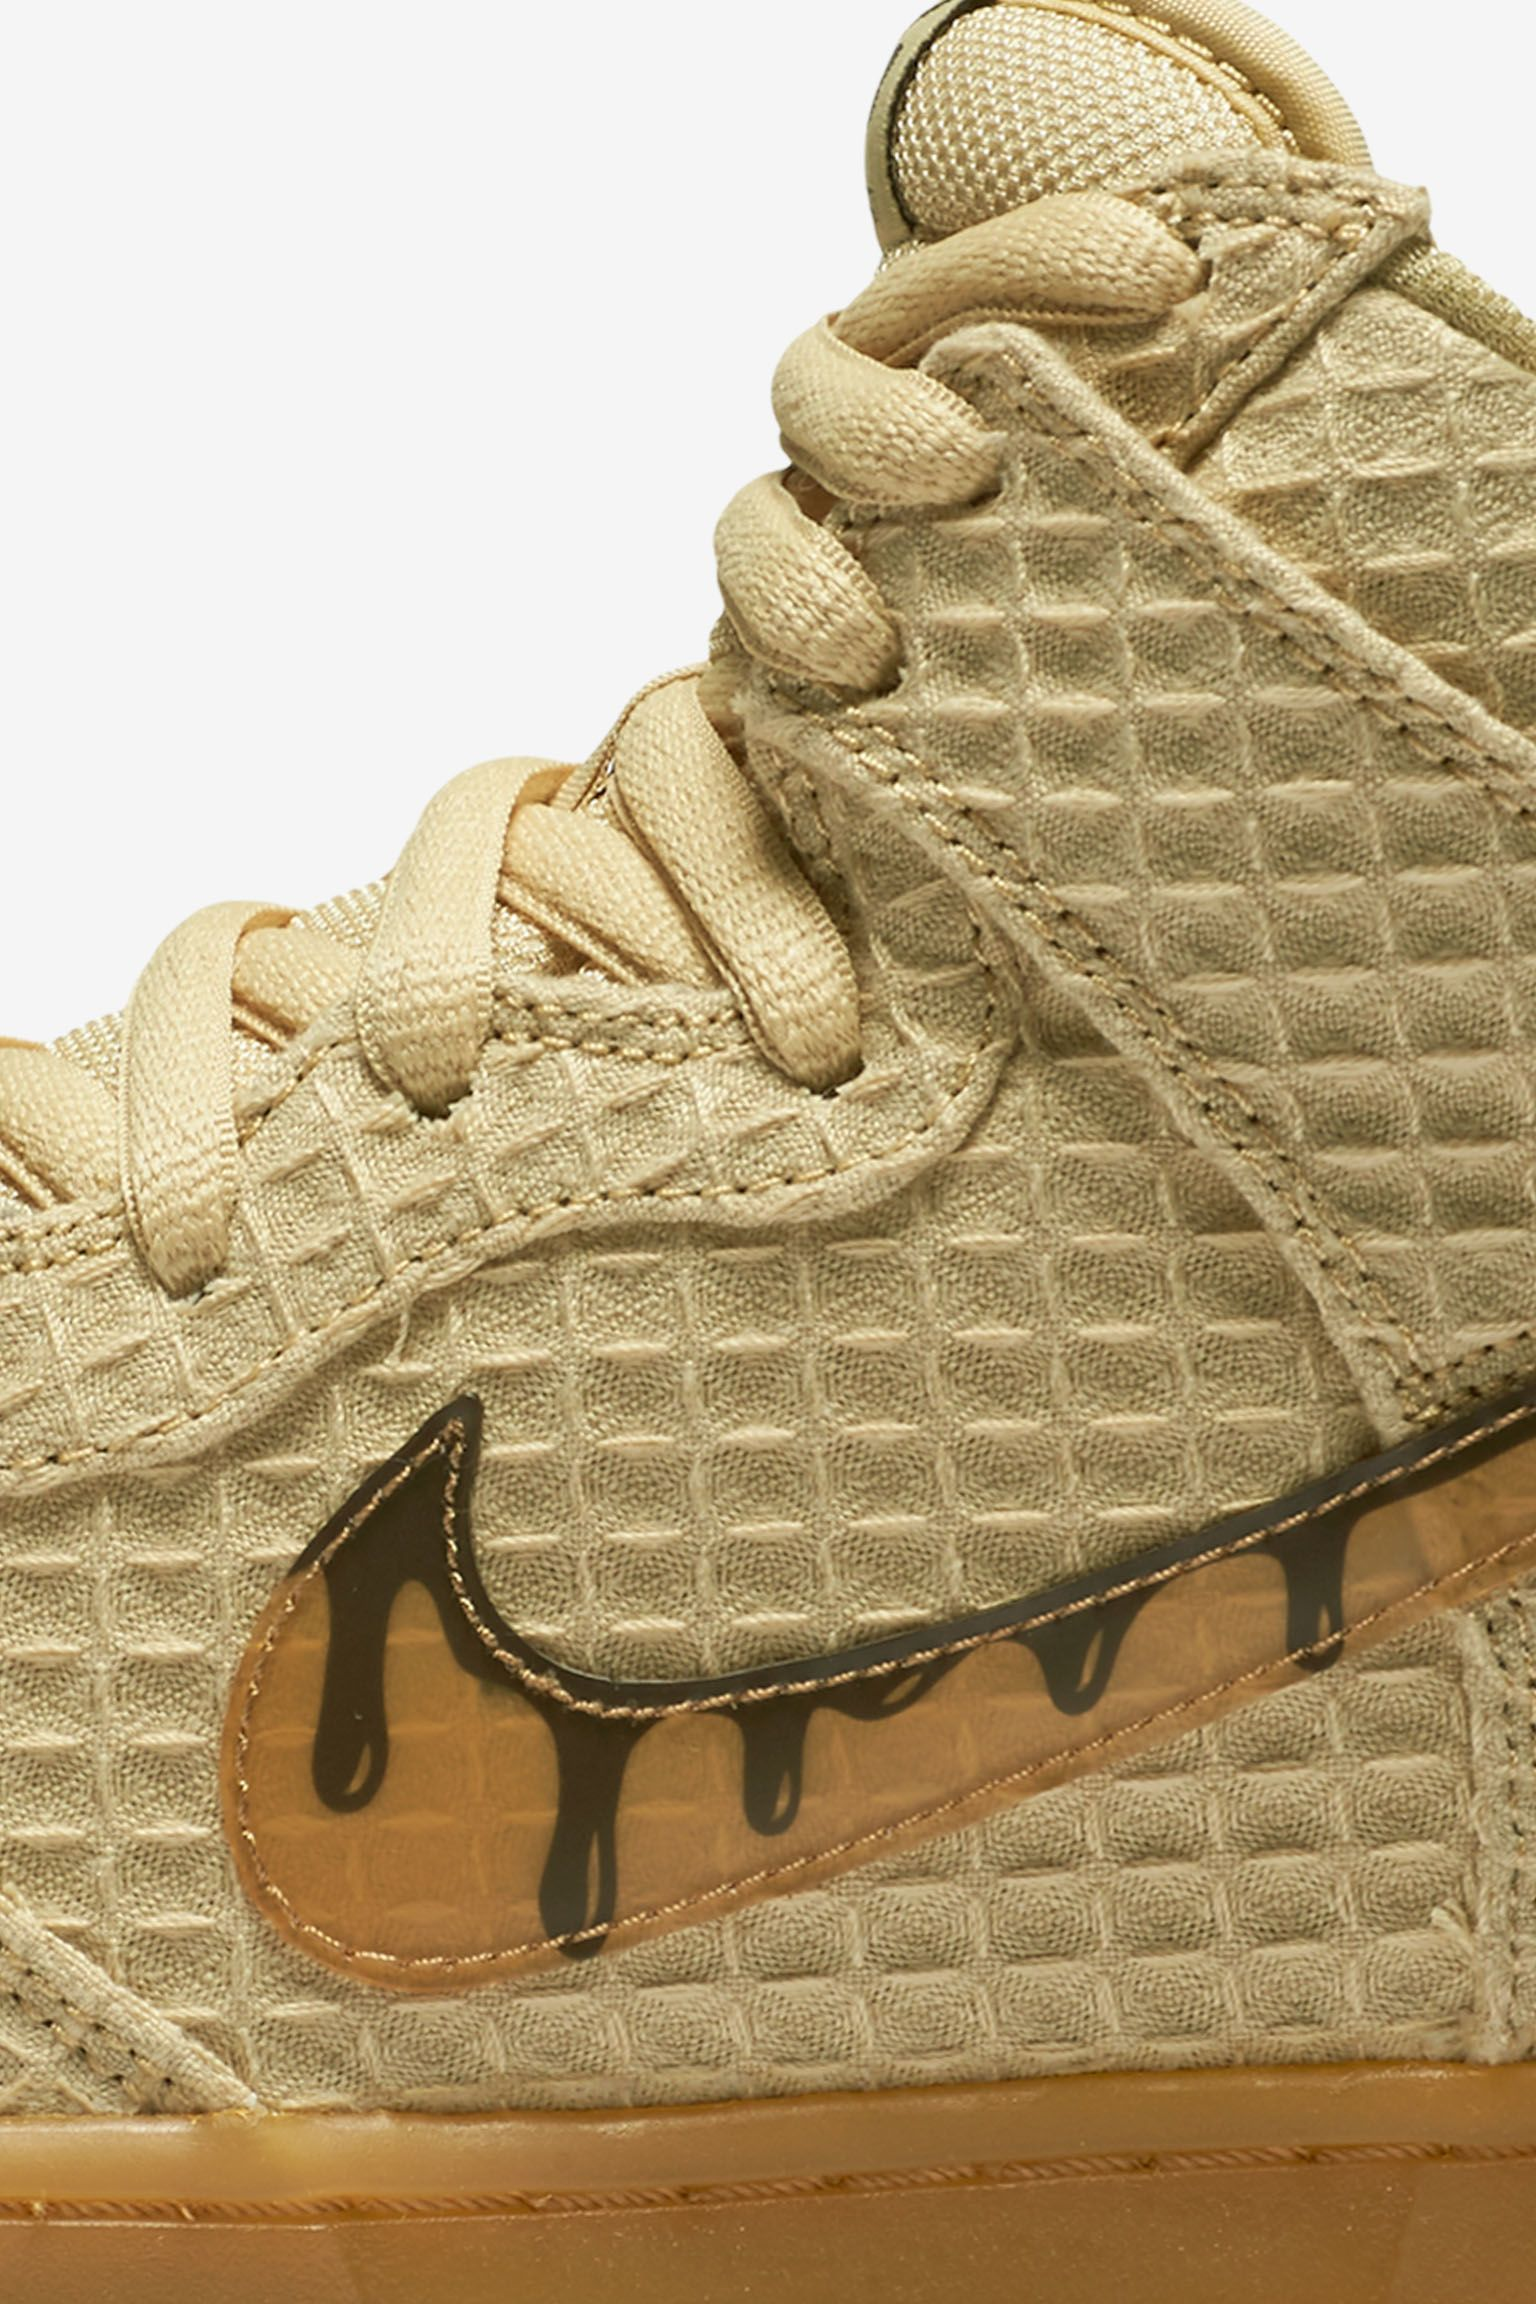 Nike Dunk High SB Premium 'Waffle' Release Date